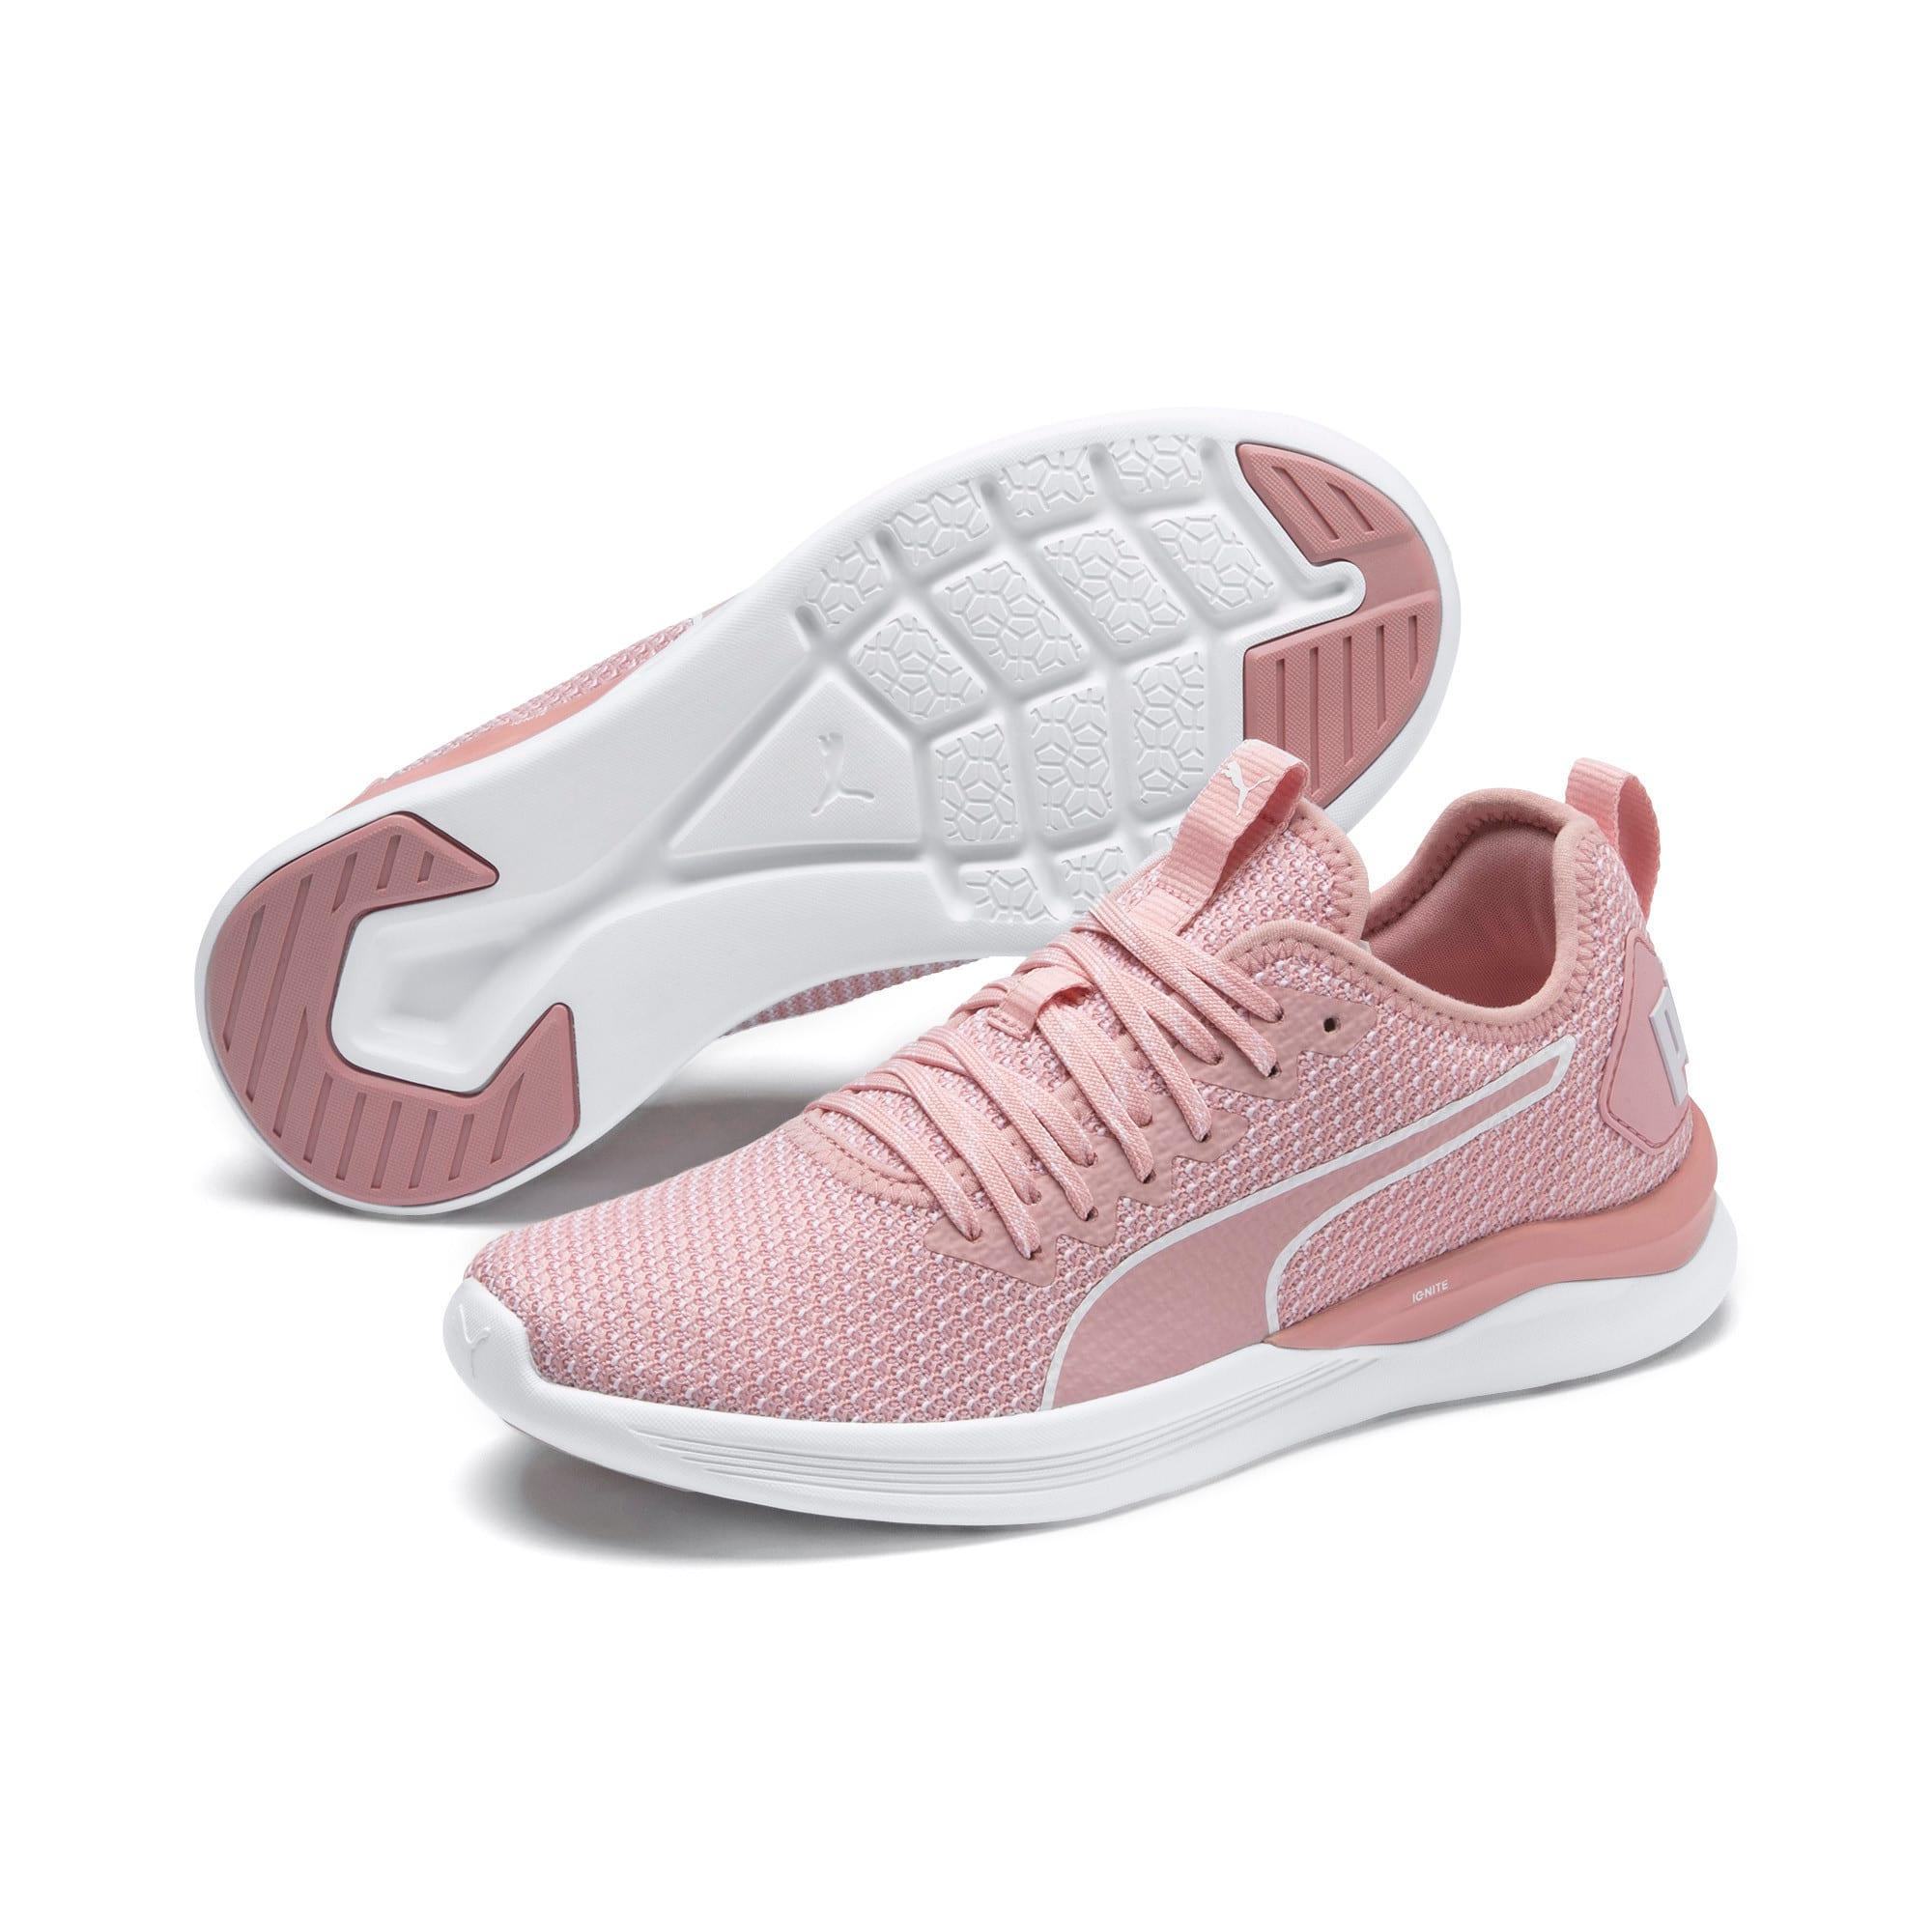 Thumbnail 2 of IGNITE Flash Women's Training Shoes, Bridal Rose-Puma White, medium